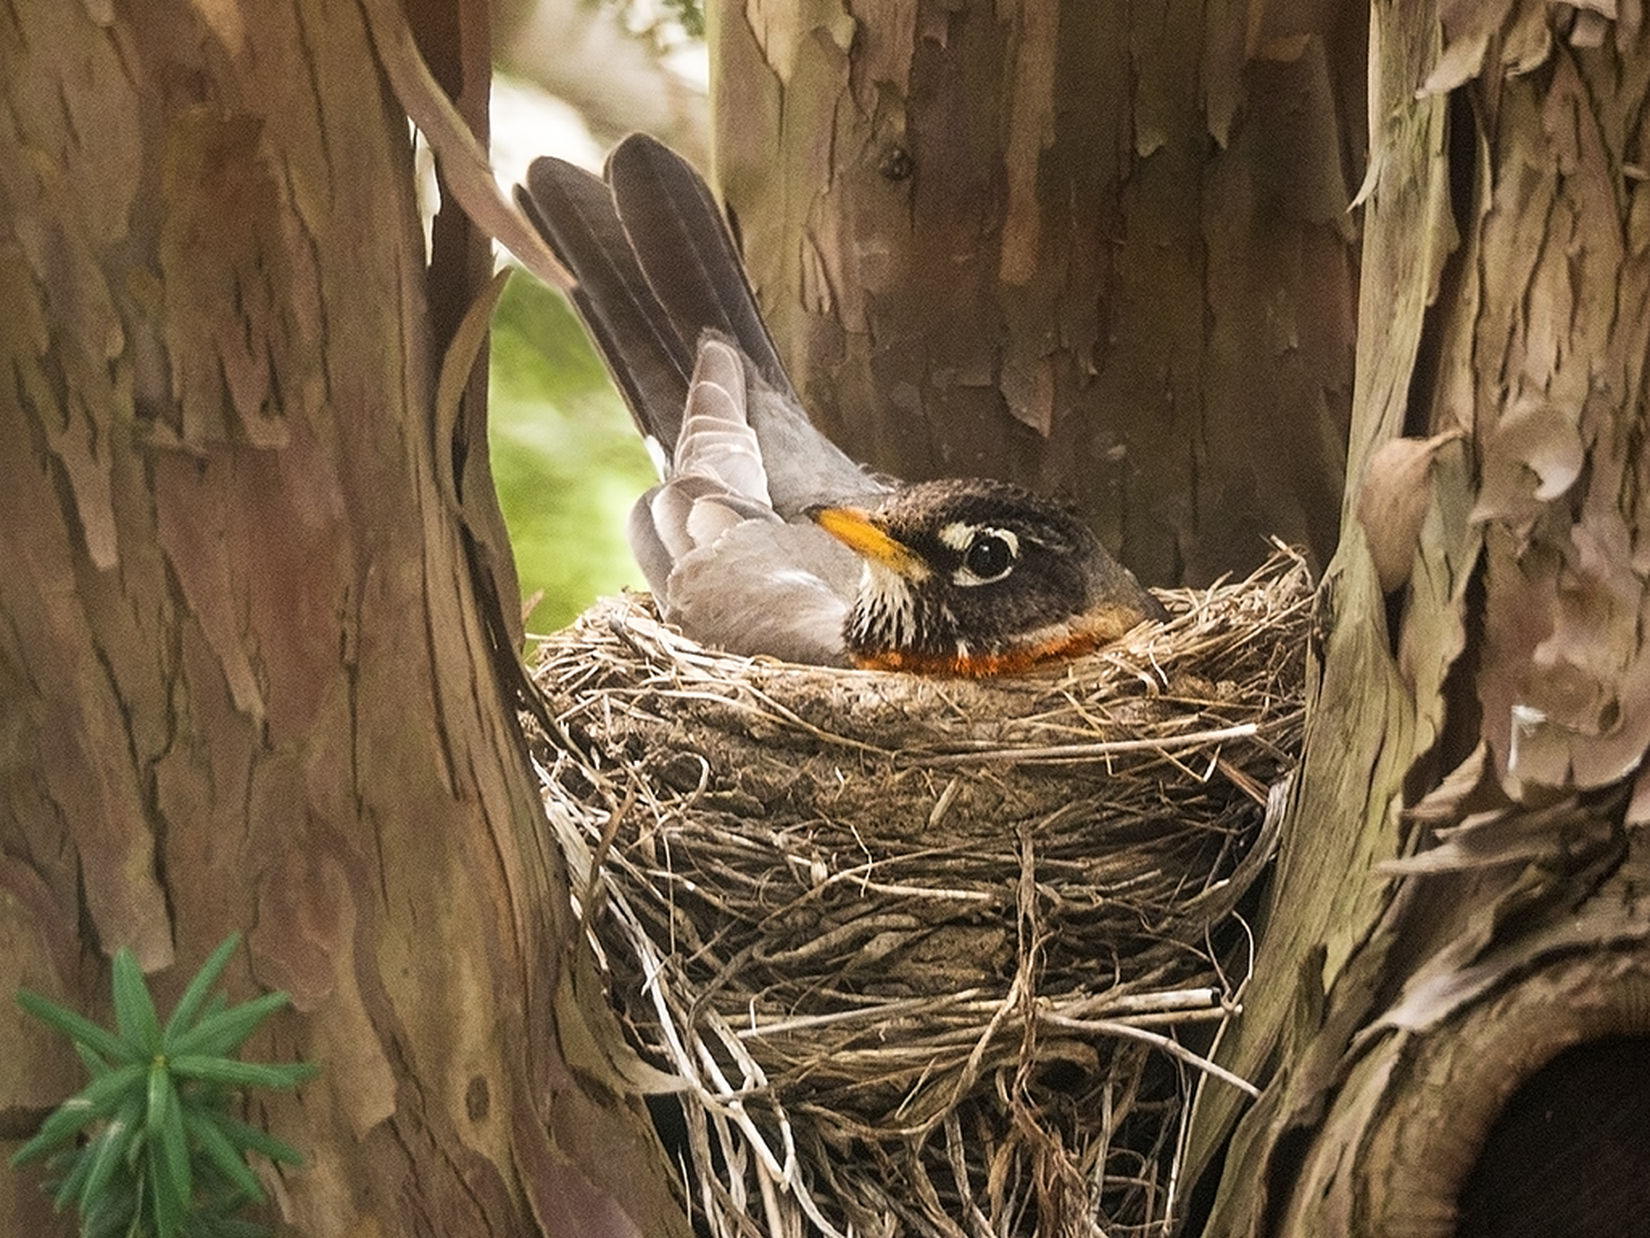 Happy Mom's Day! Mothersday Robin Birds Nest East Chatham NY Hudsonvalley Columbia County Upstateny New York Signs Of Spring